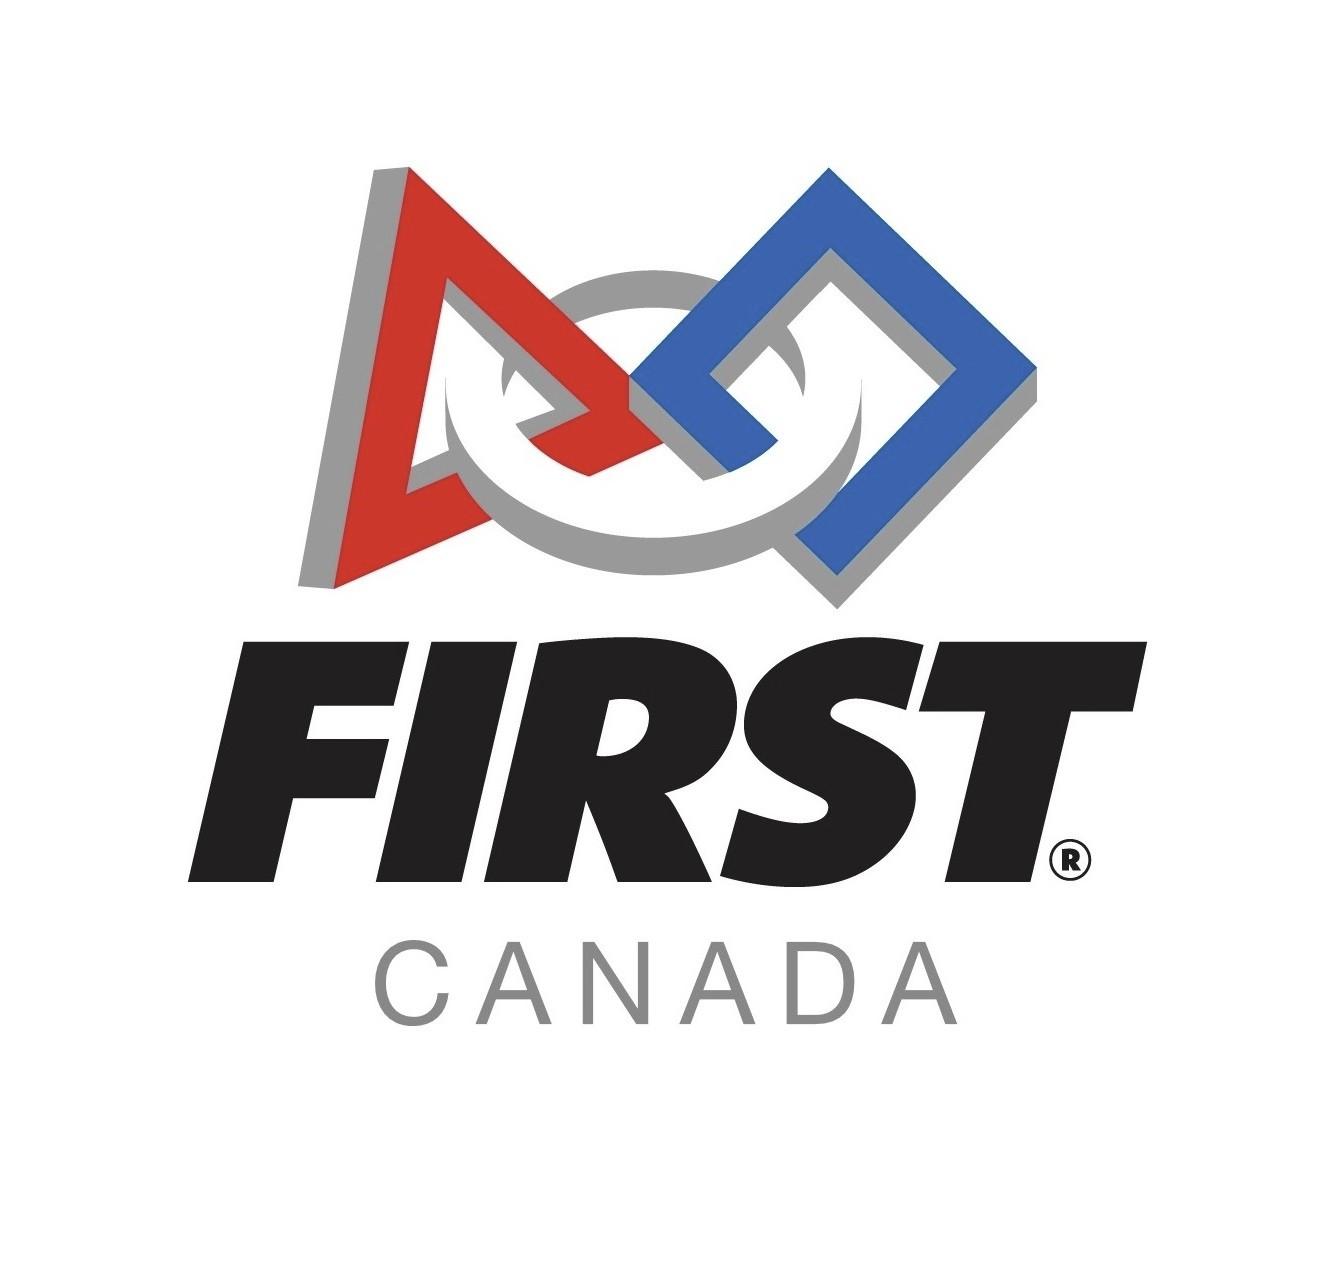 FIRST CANADA - EV3